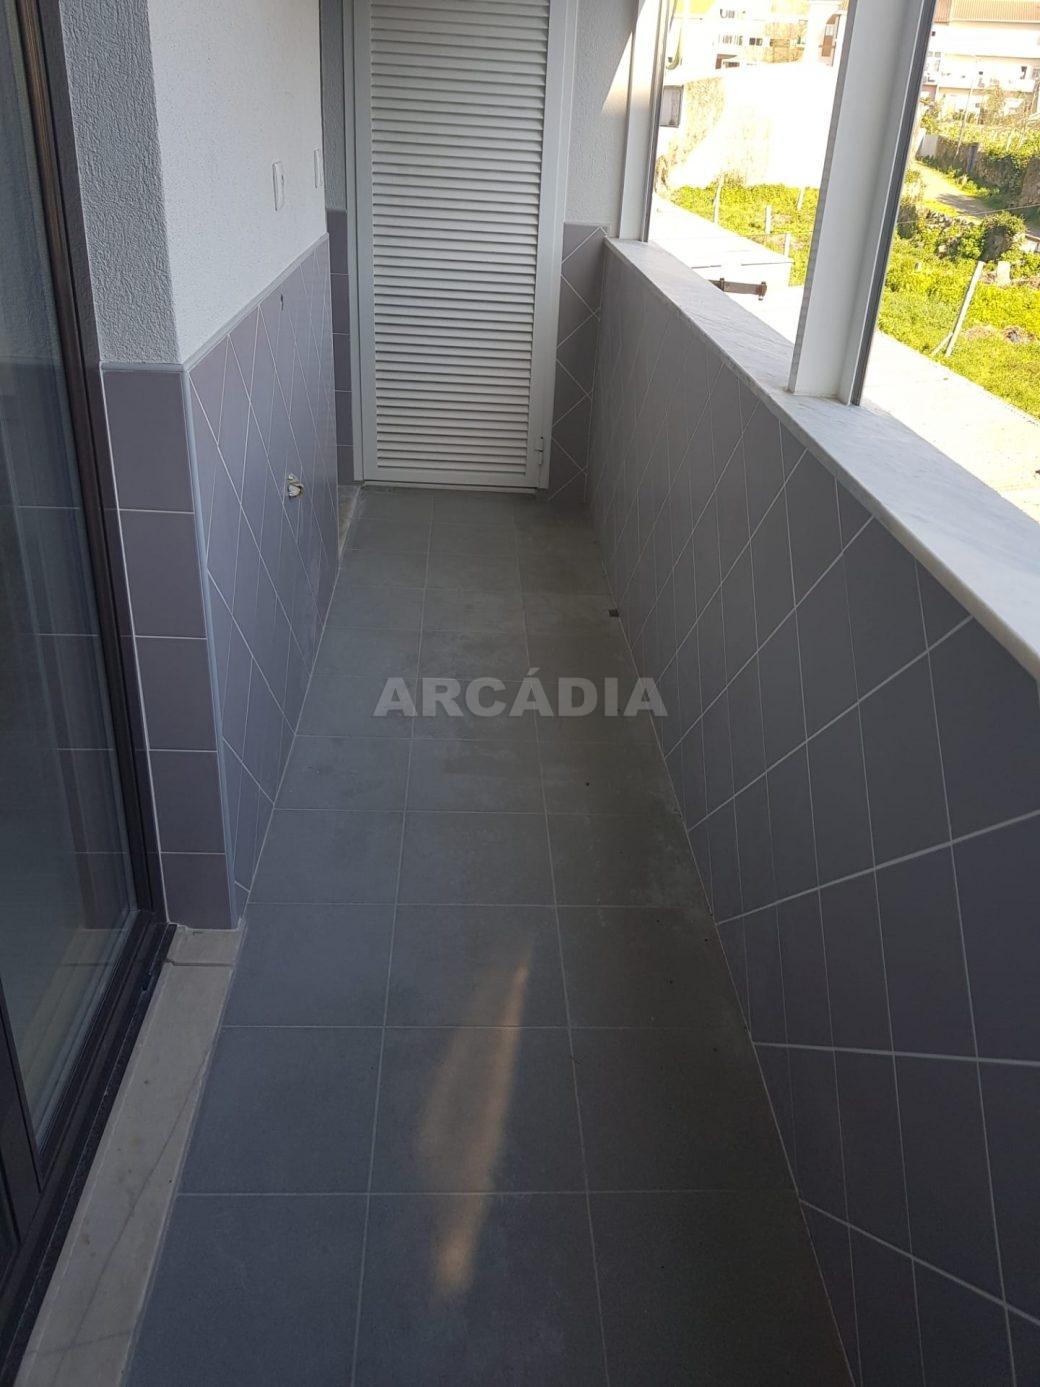 arcadia-imobiliaria-braga-apartamento-tipo-3-arrendamento-sao-lazaro-remodelado-excelente-preco-unica-oportunidade28